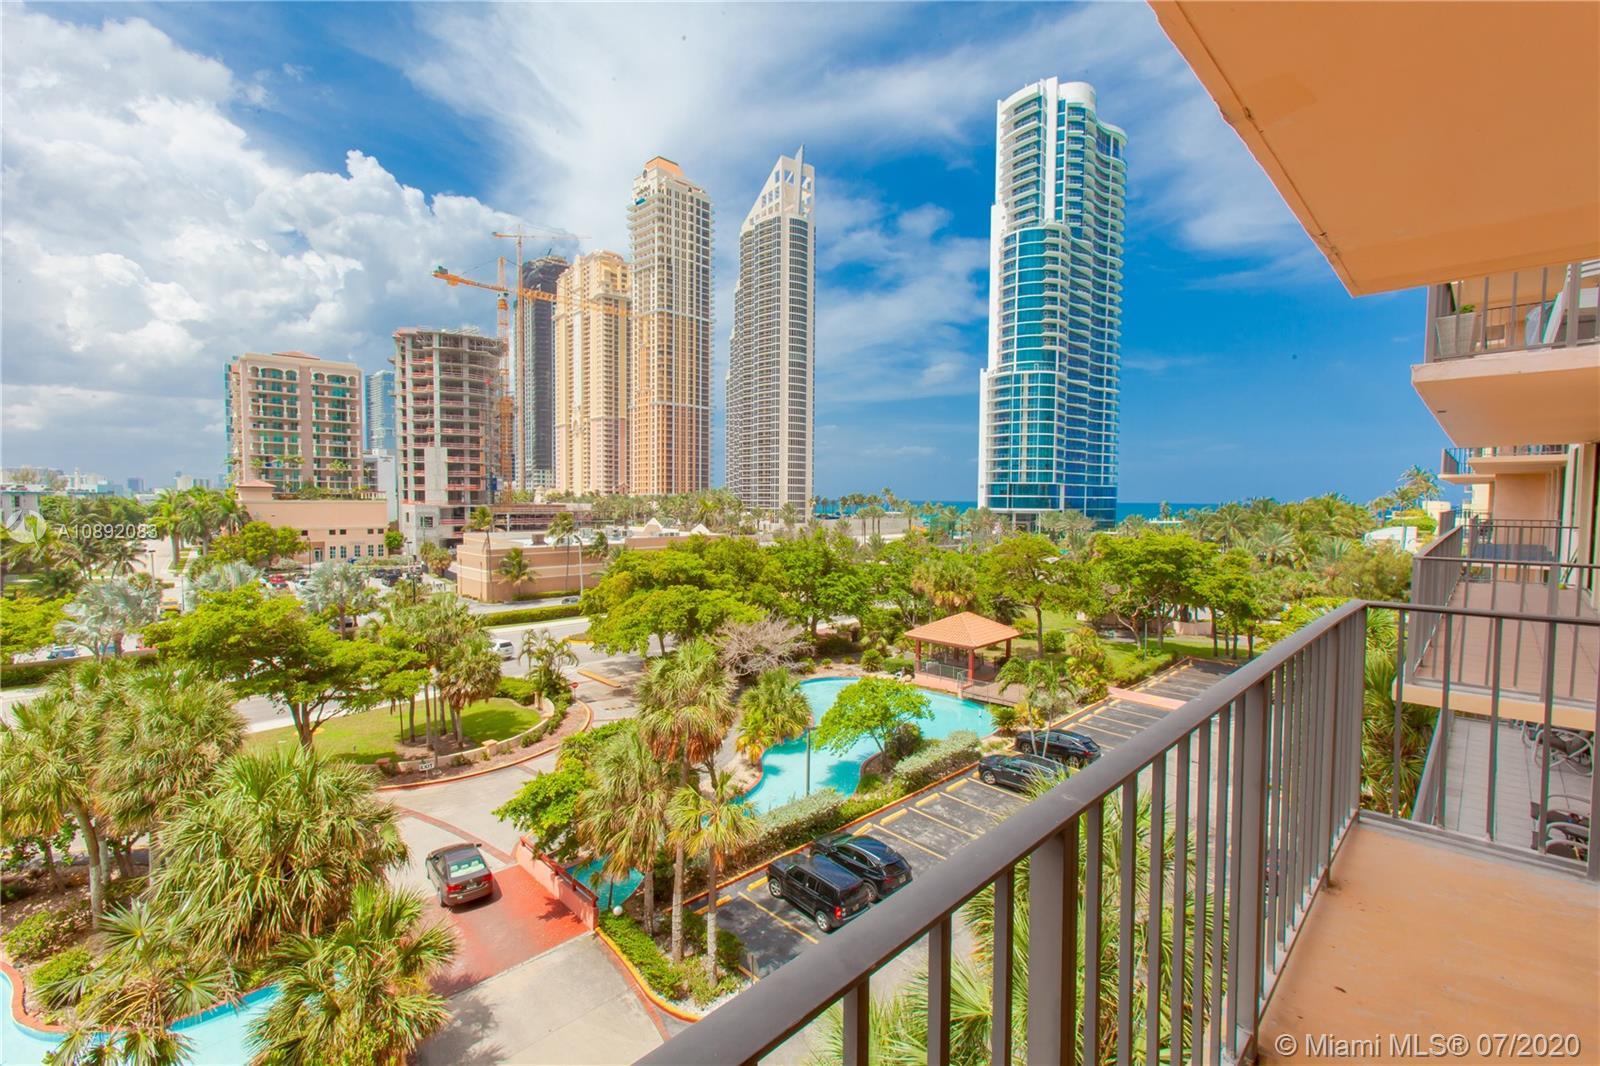 Winston Tower 600 #616 - 210 174th St #616, Sunny Isles Beach, FL 33160